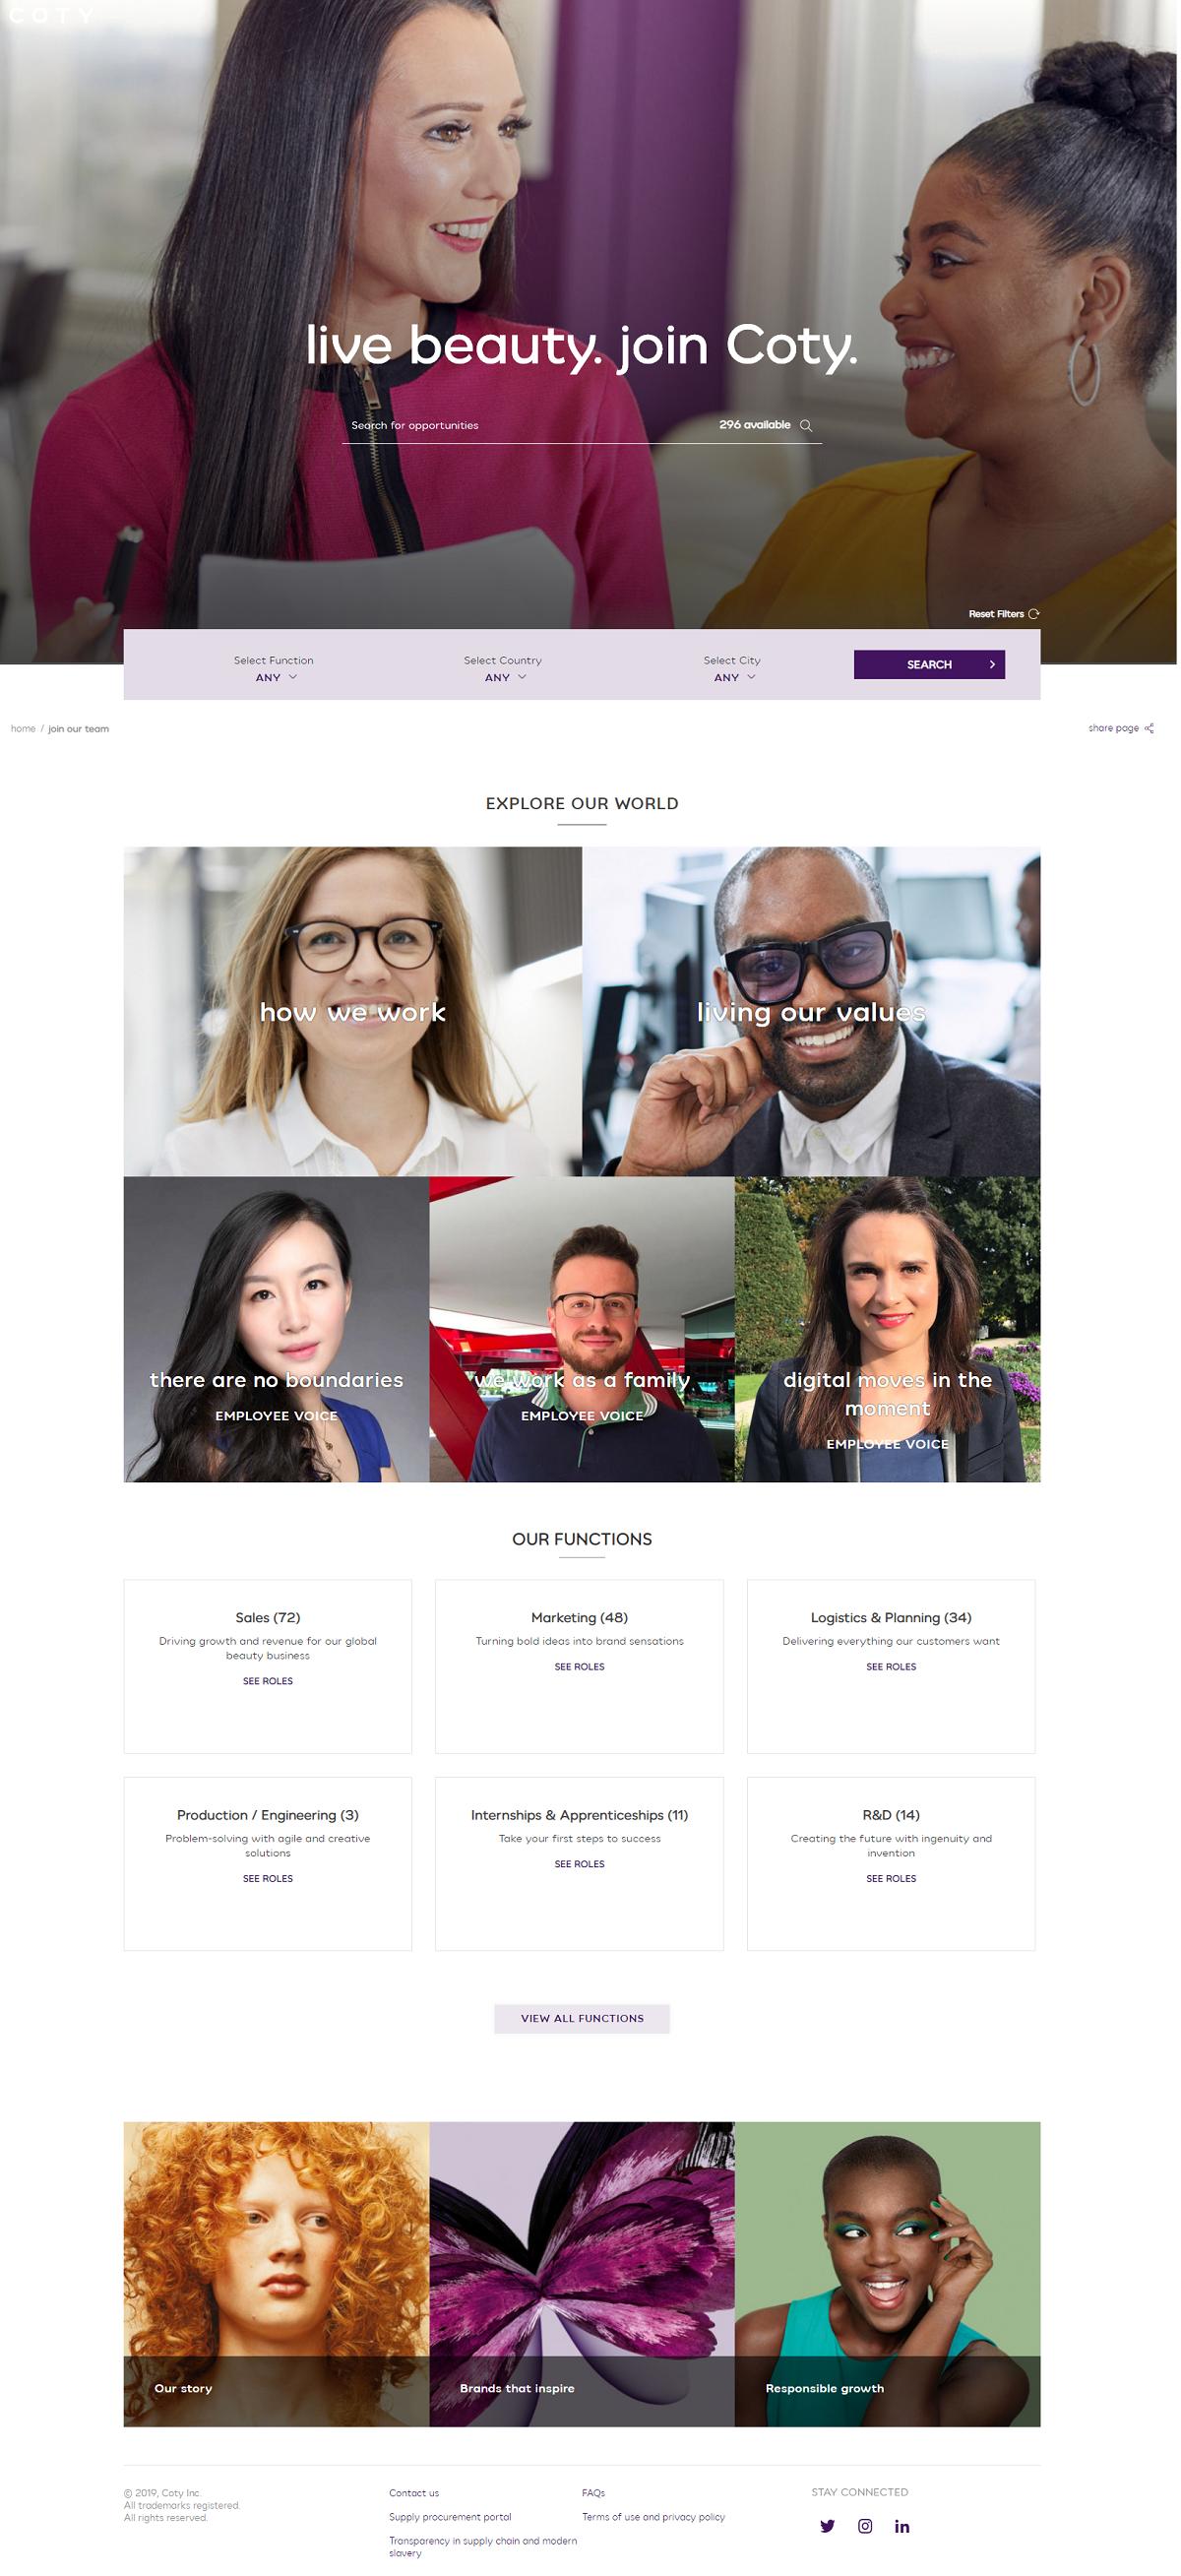 Coty company career page